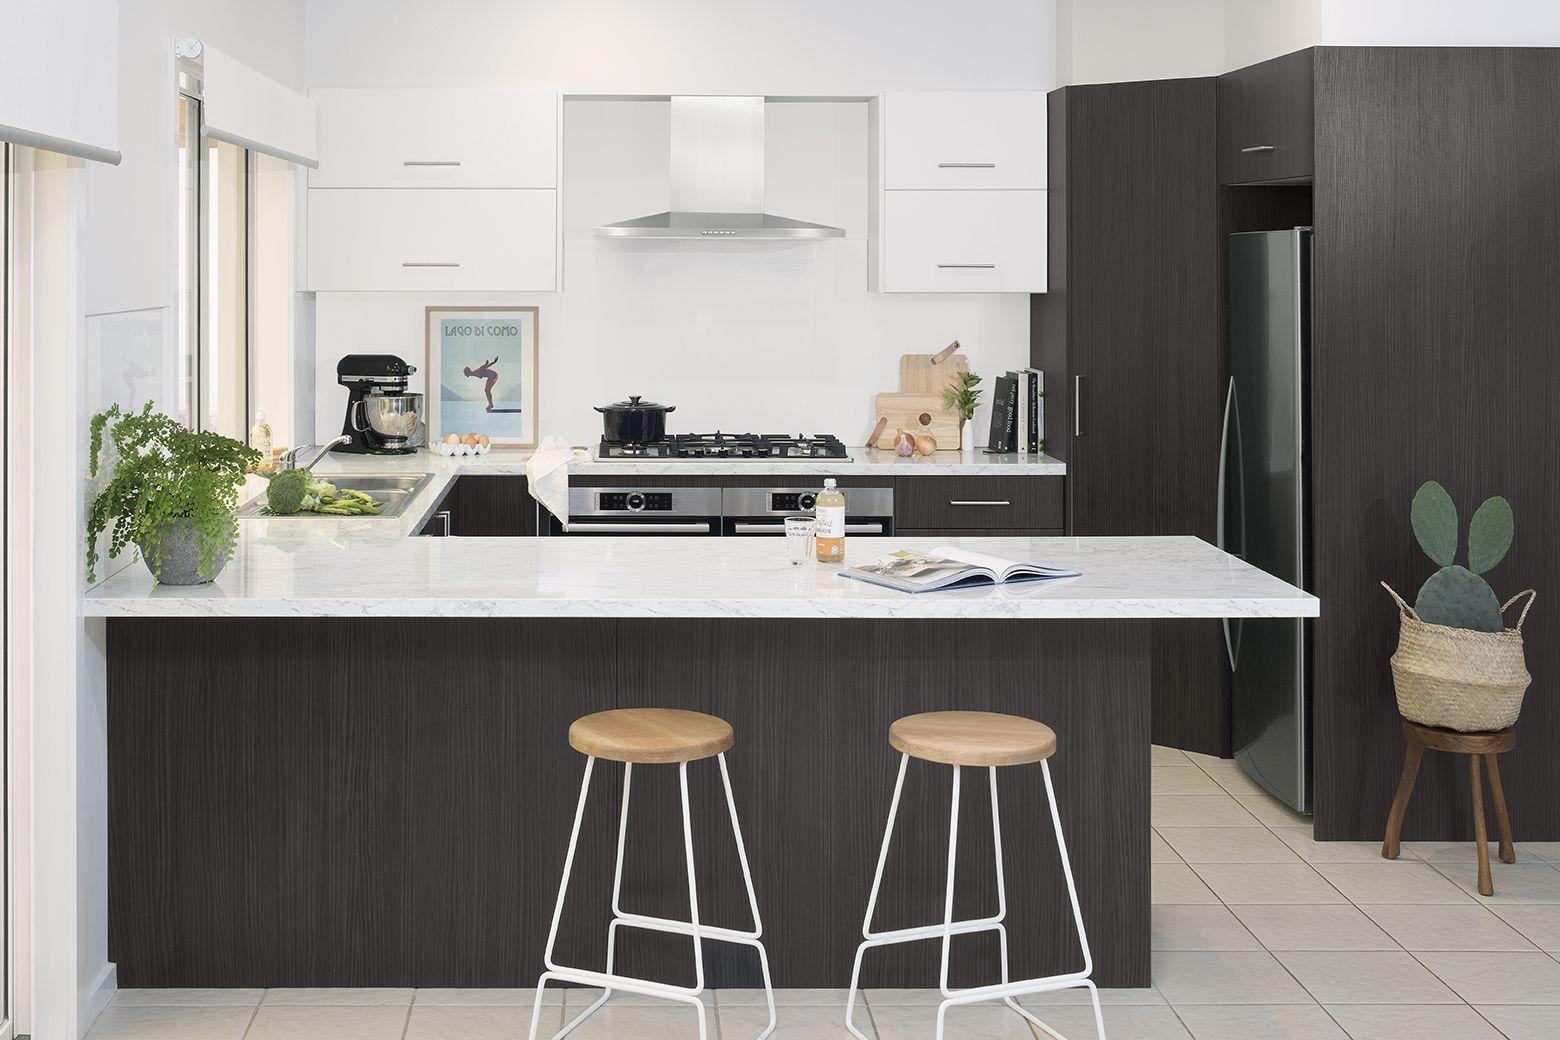 Kitchen inspiration photoshoot   kaboodle kitchen   Kitchen design ...